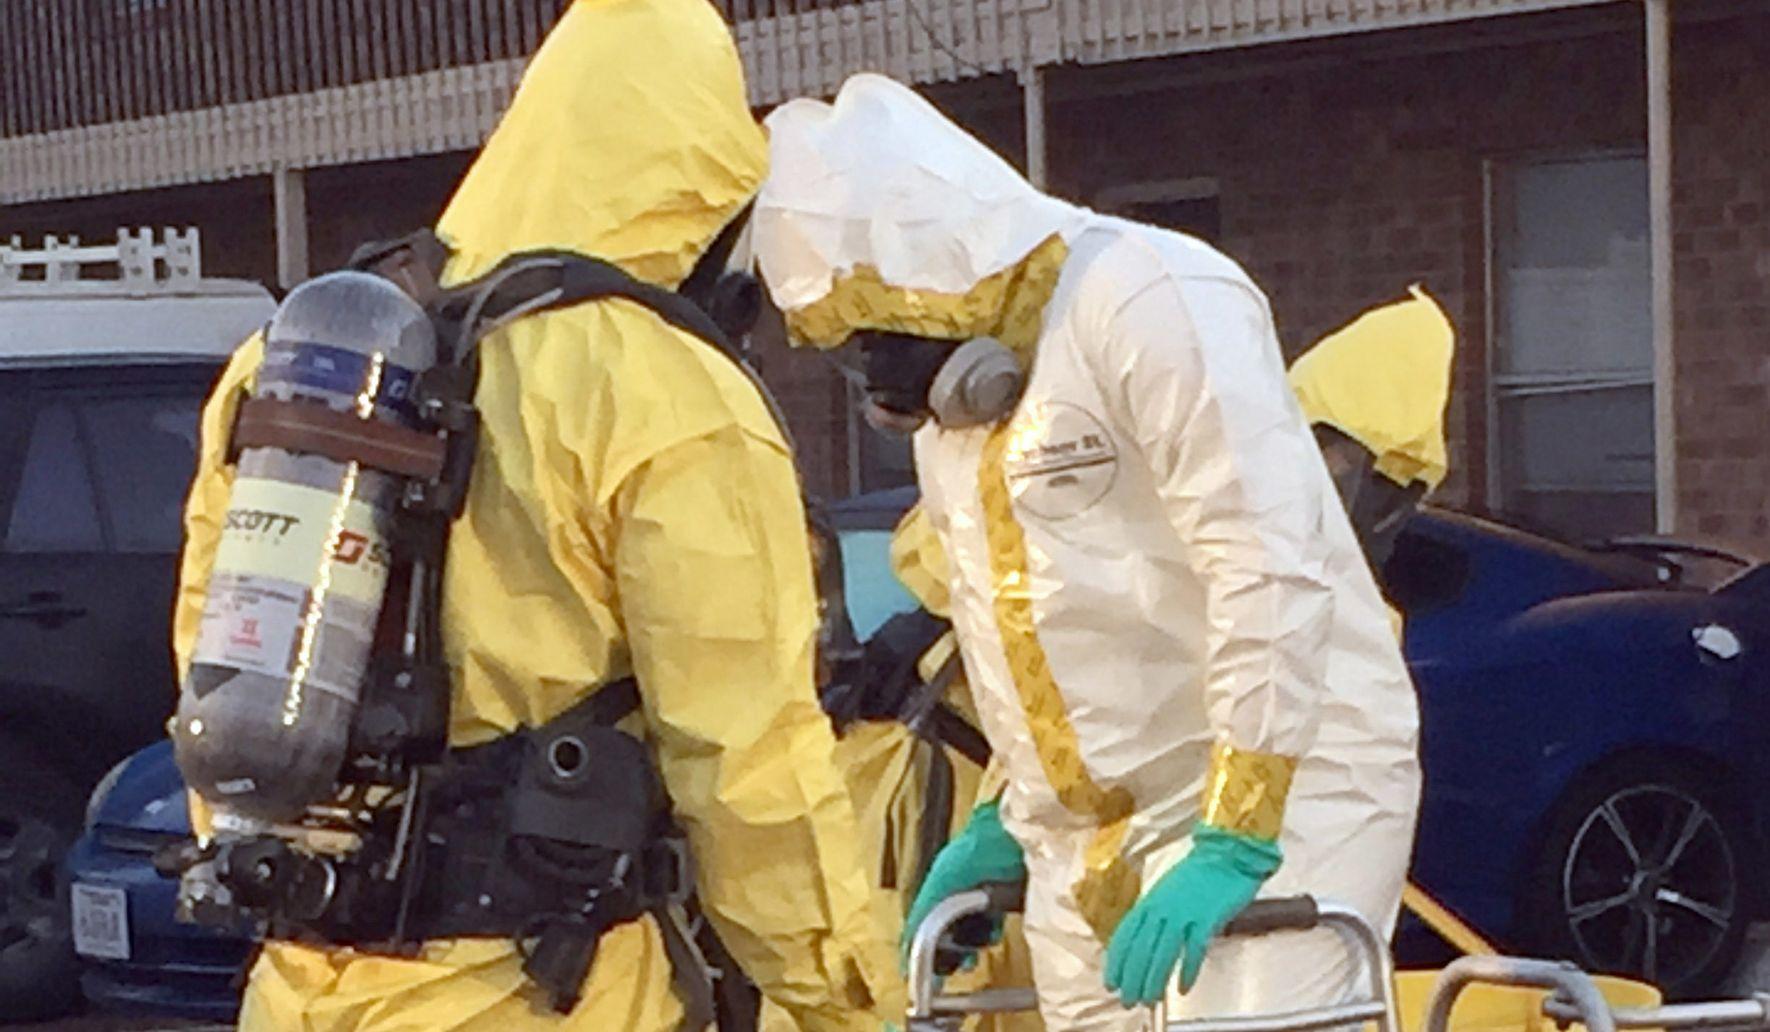 Fentanyl secondary exposure can kill in small amounts - Washington Times